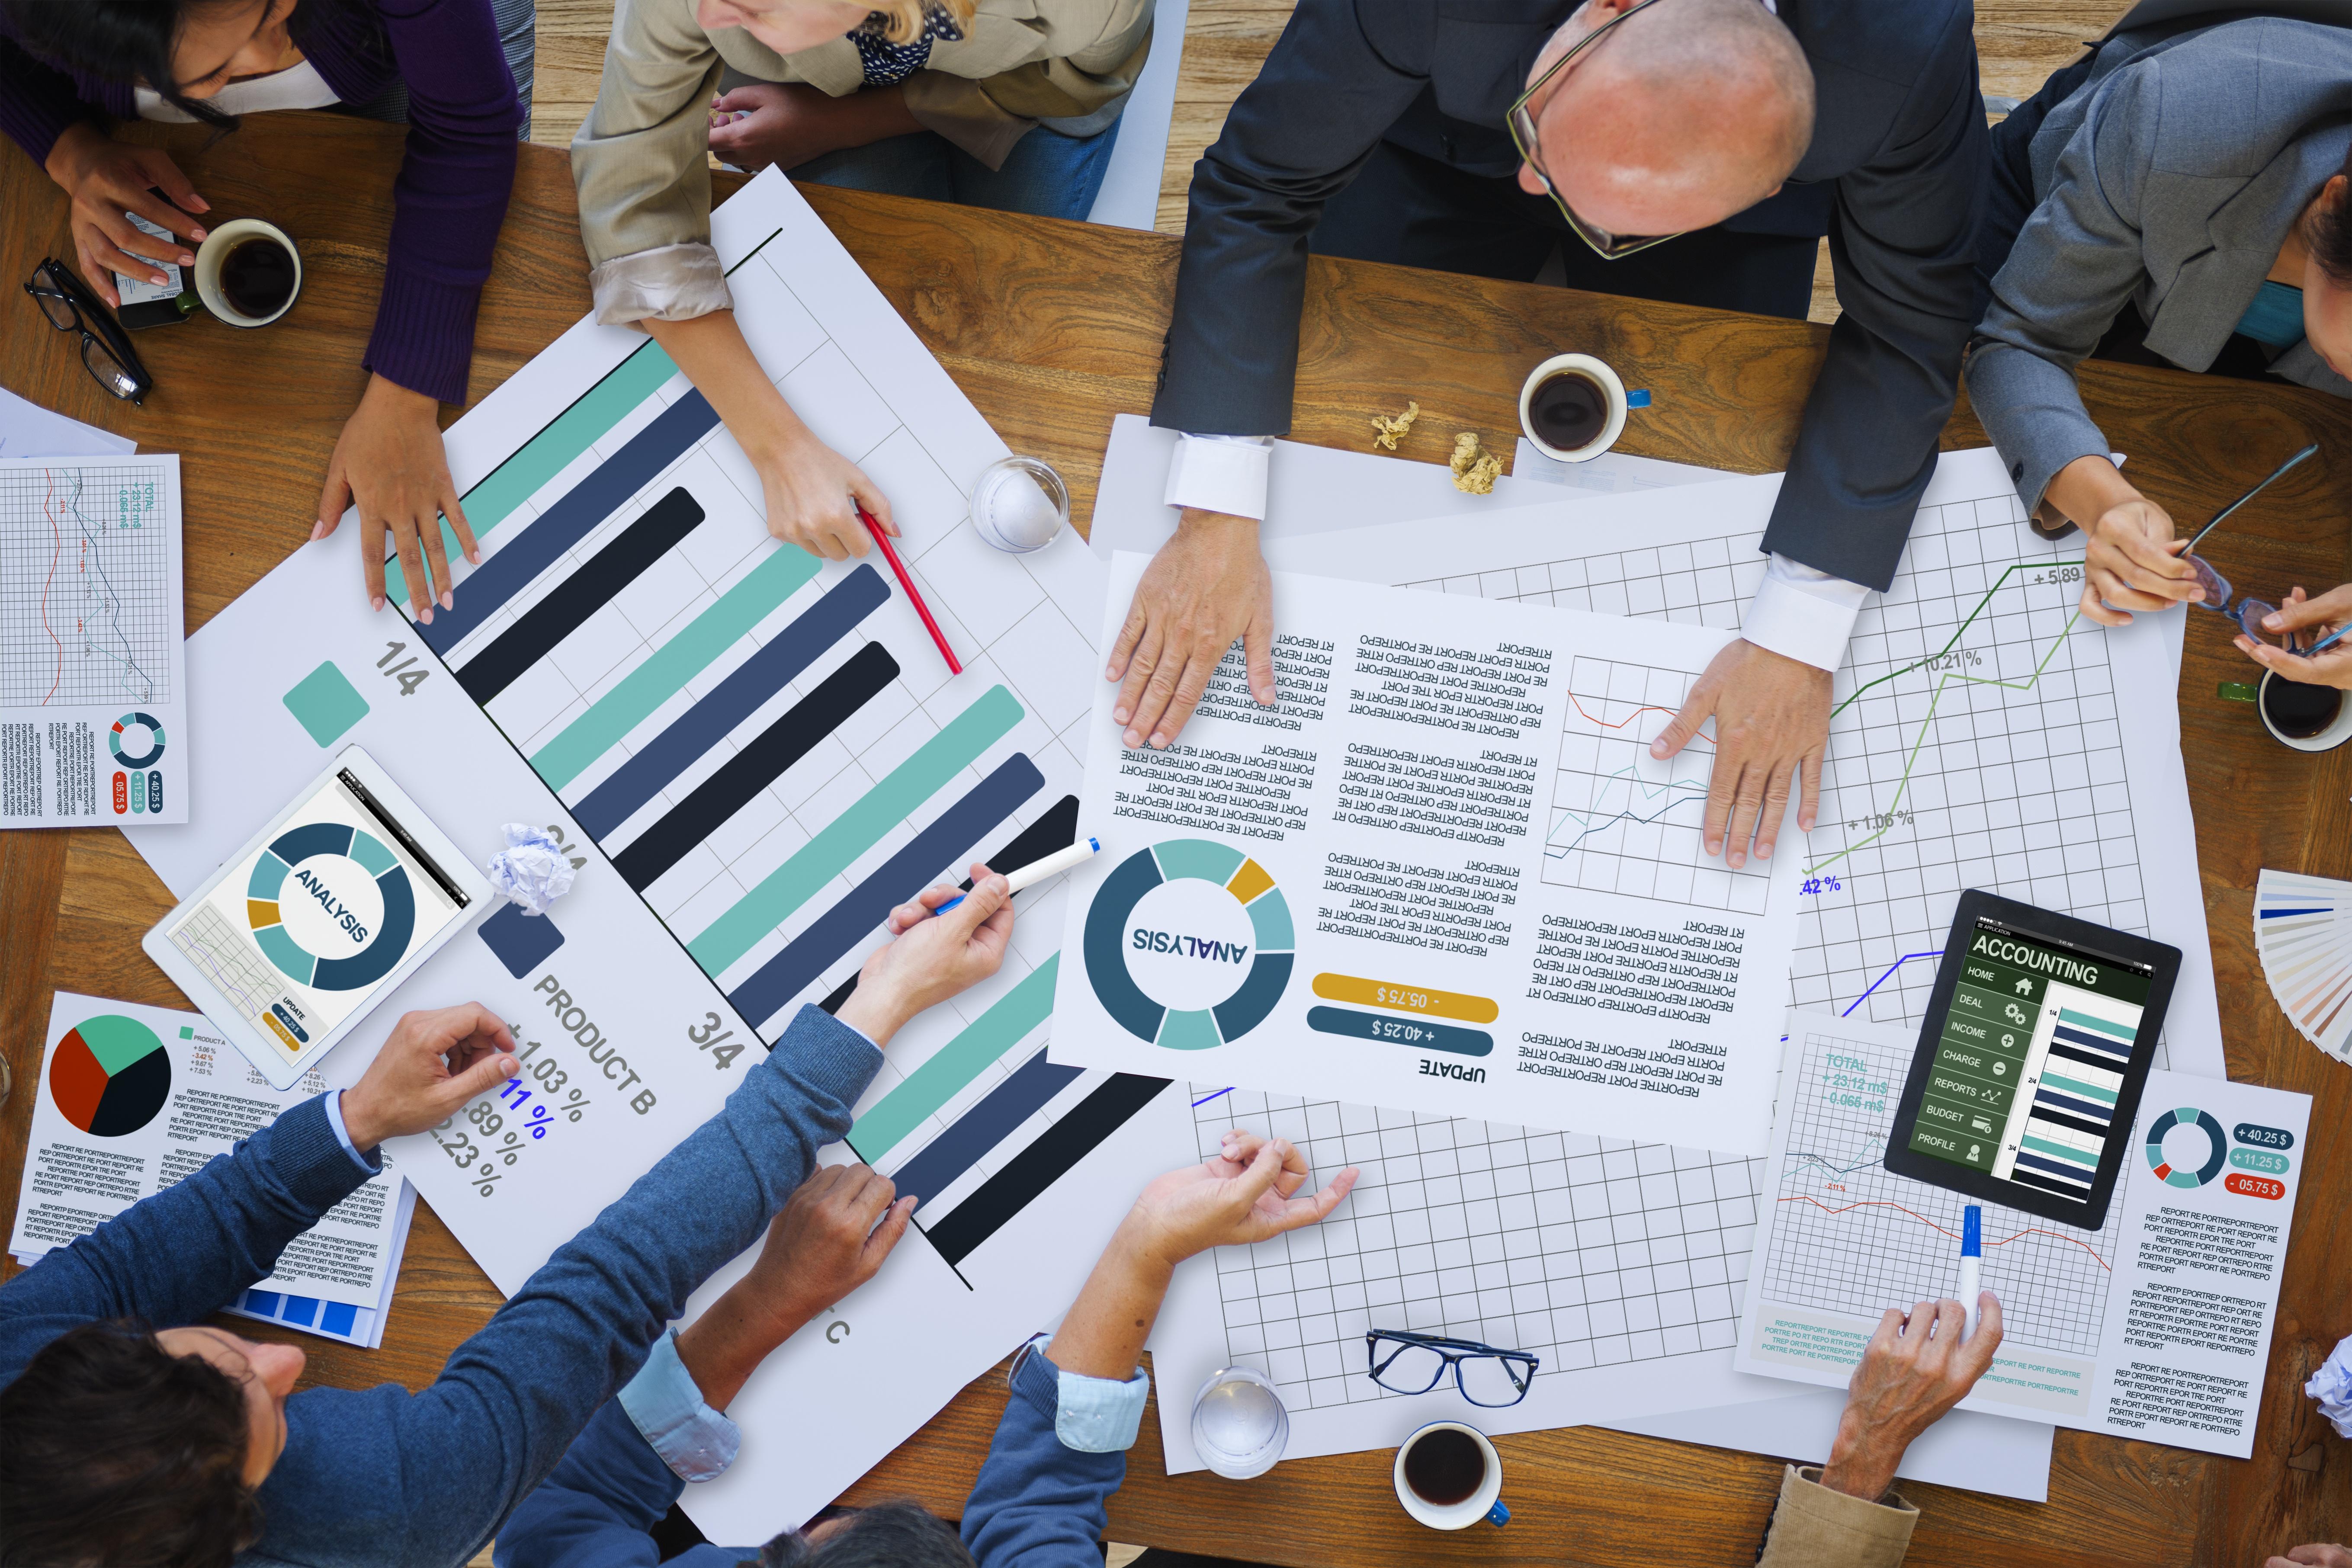 bigstock-Business-People-Meeting-Corpor-80905412